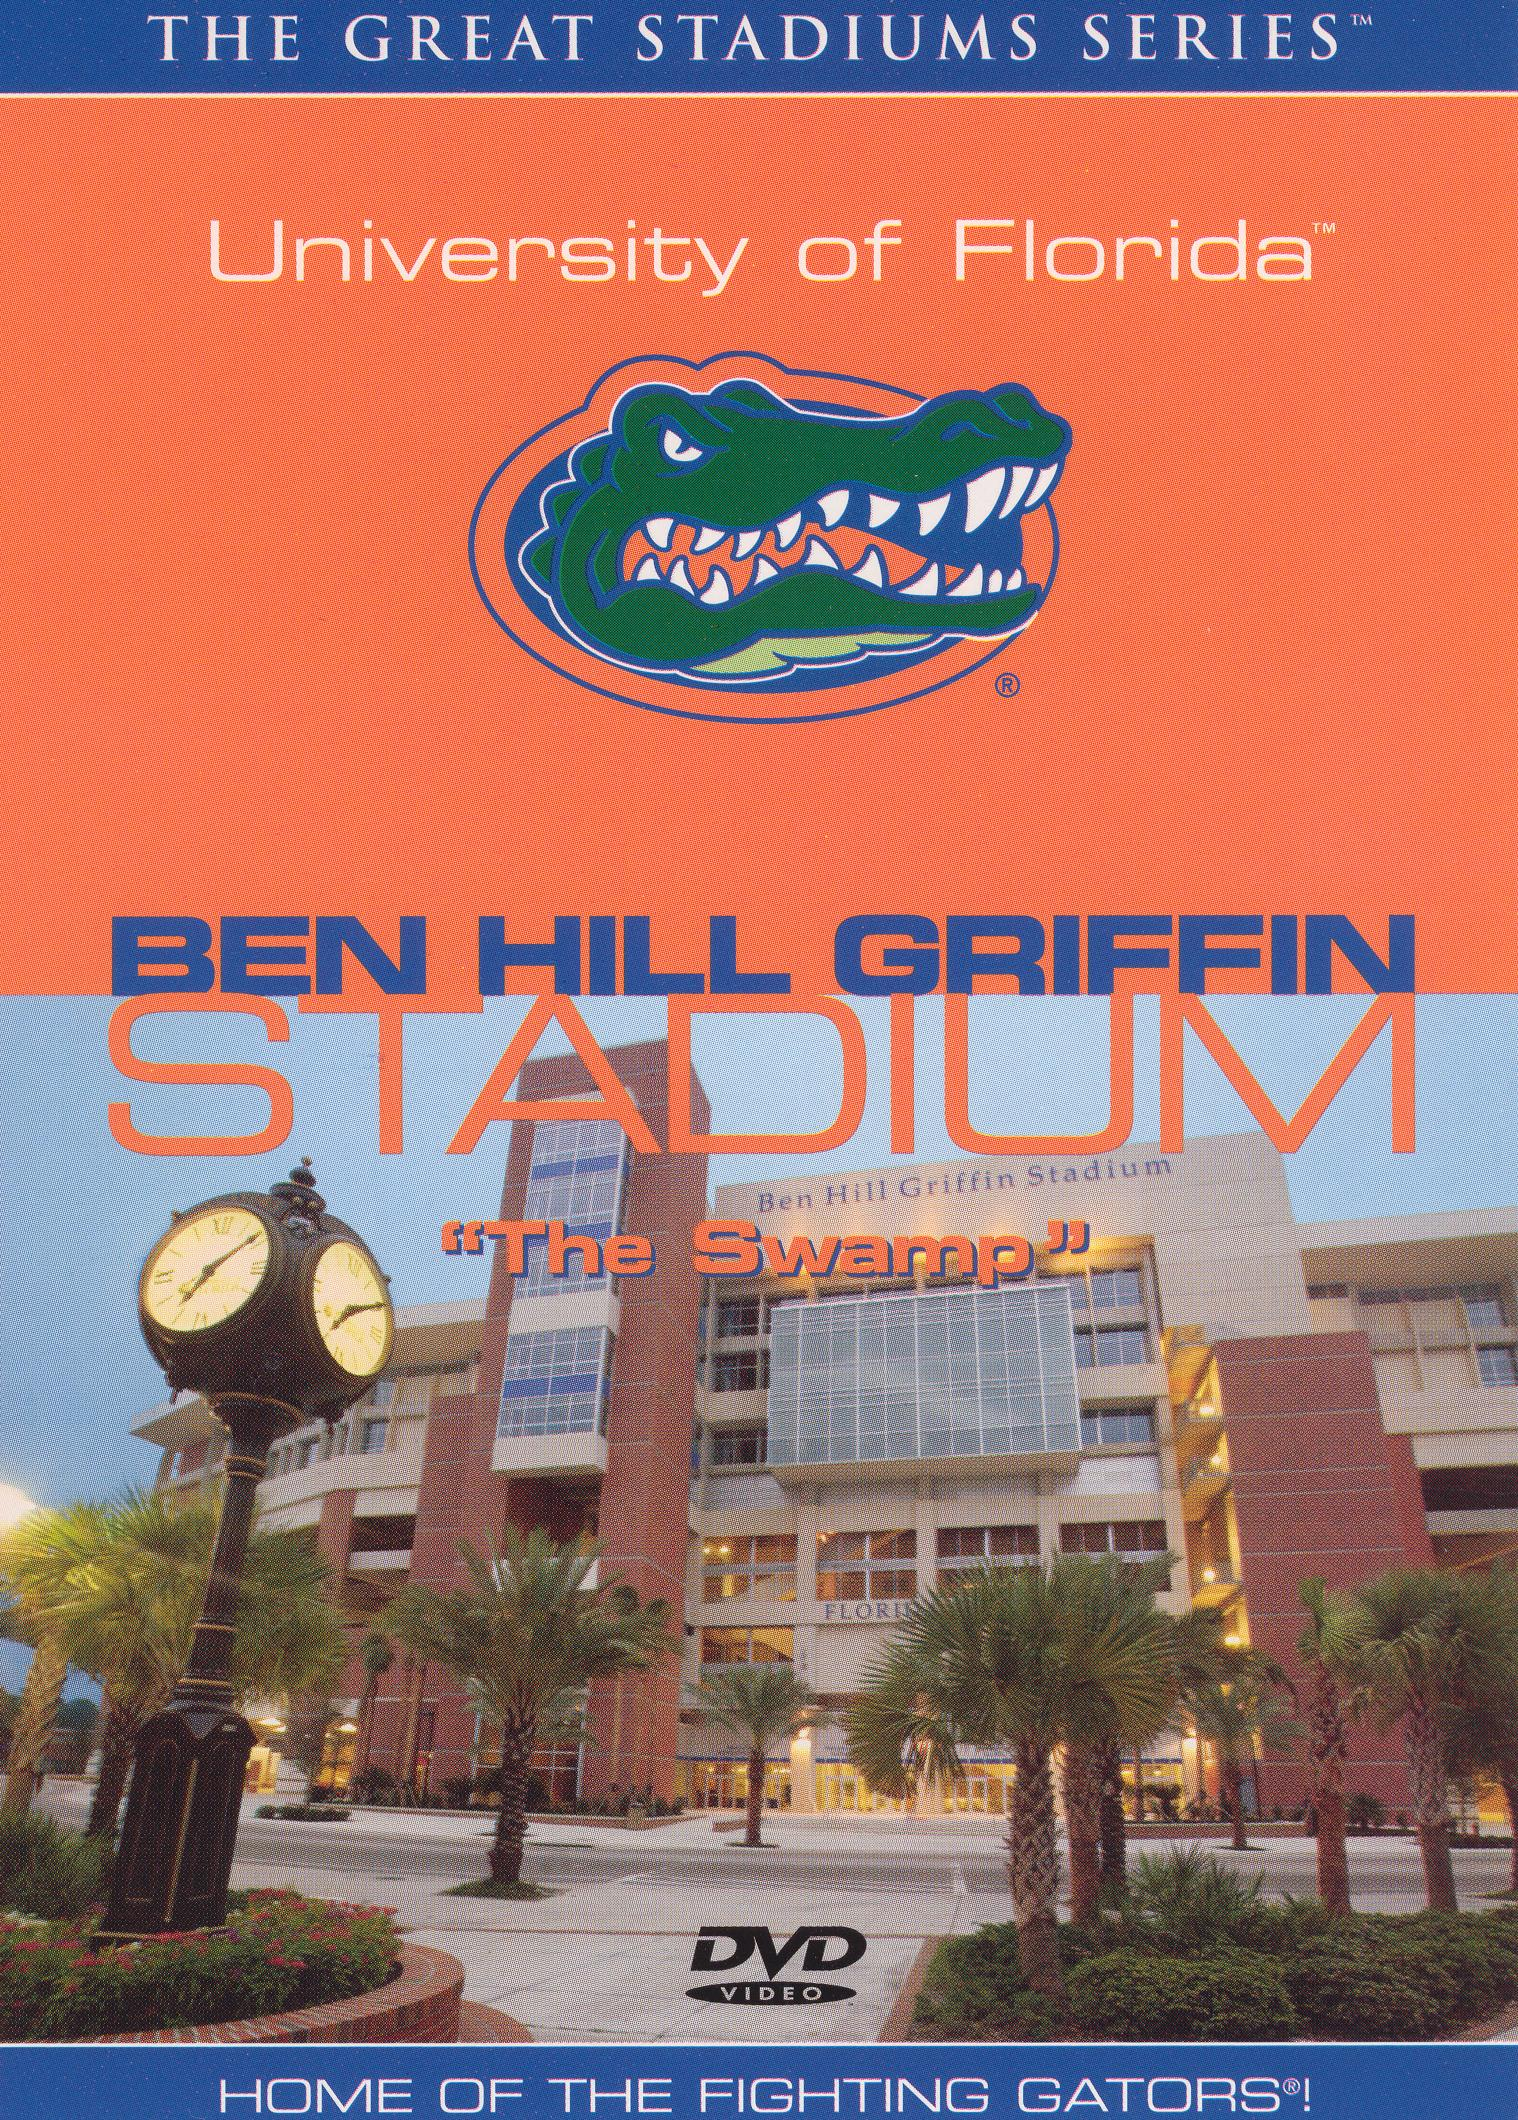 University of Florida: Ben Hill Griffin Stadium